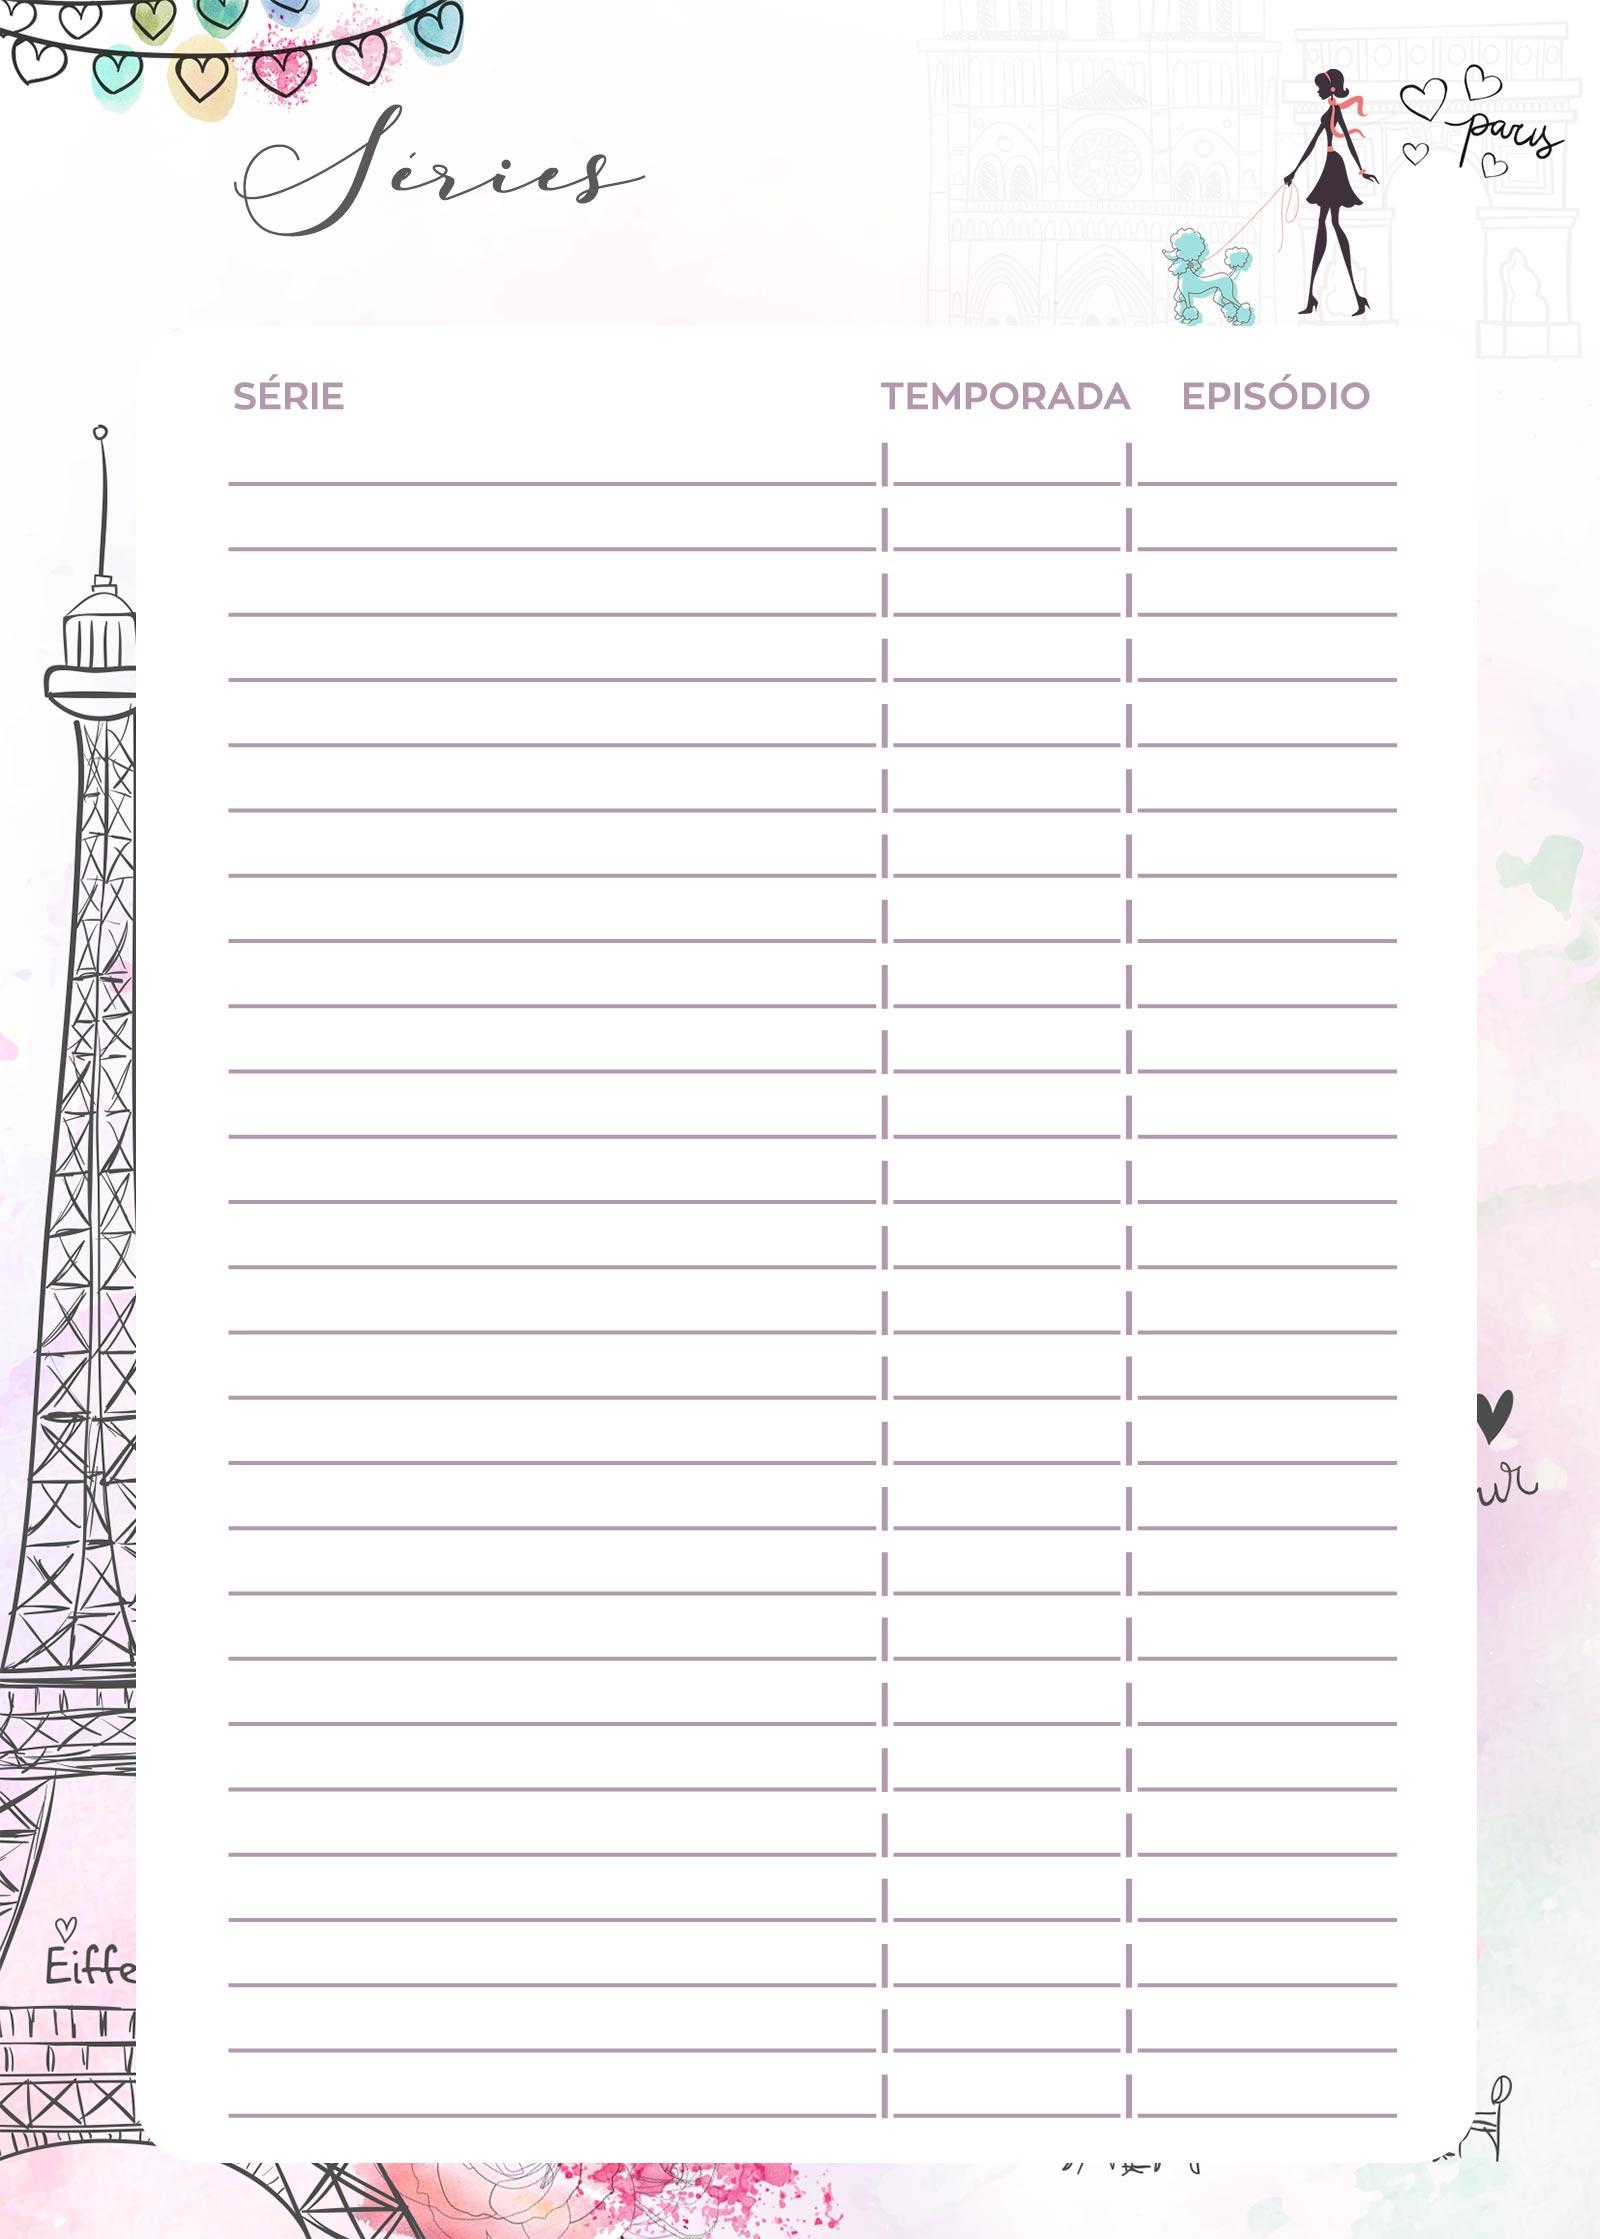 Planner 2020 Paris series